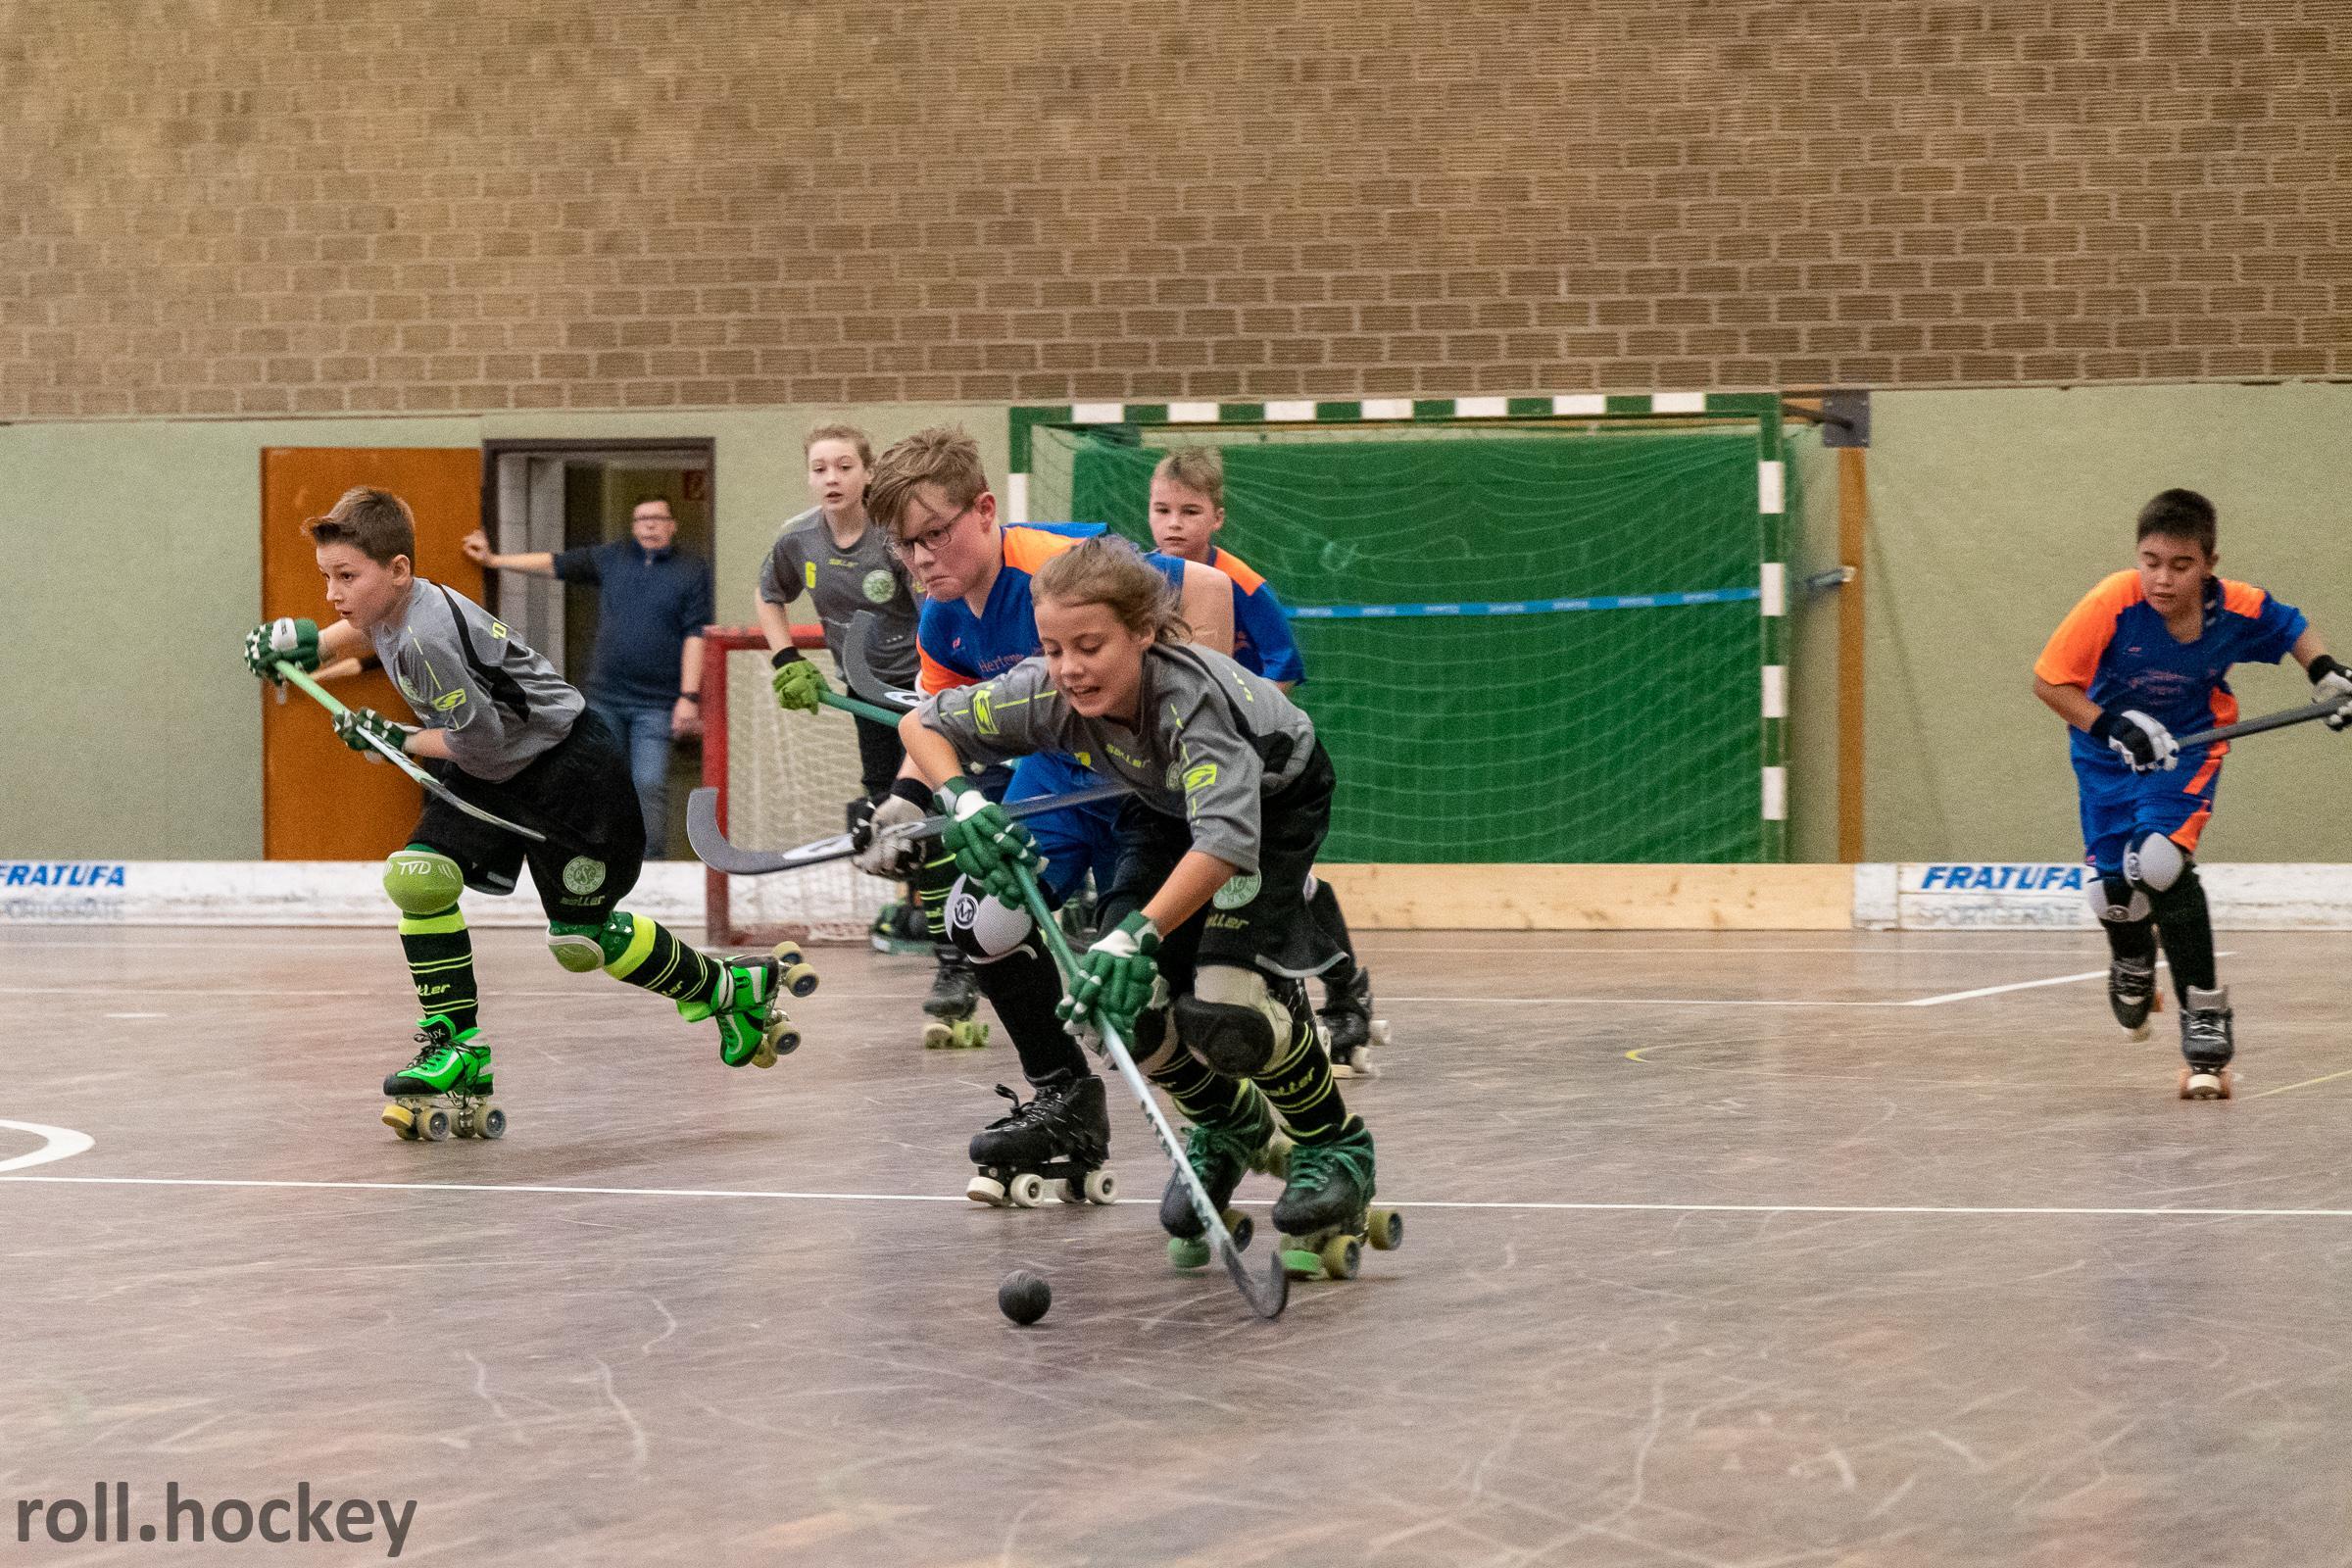 RSC Cronenberg Rollhockey Freundschaftsspiele U13 26.01.2019